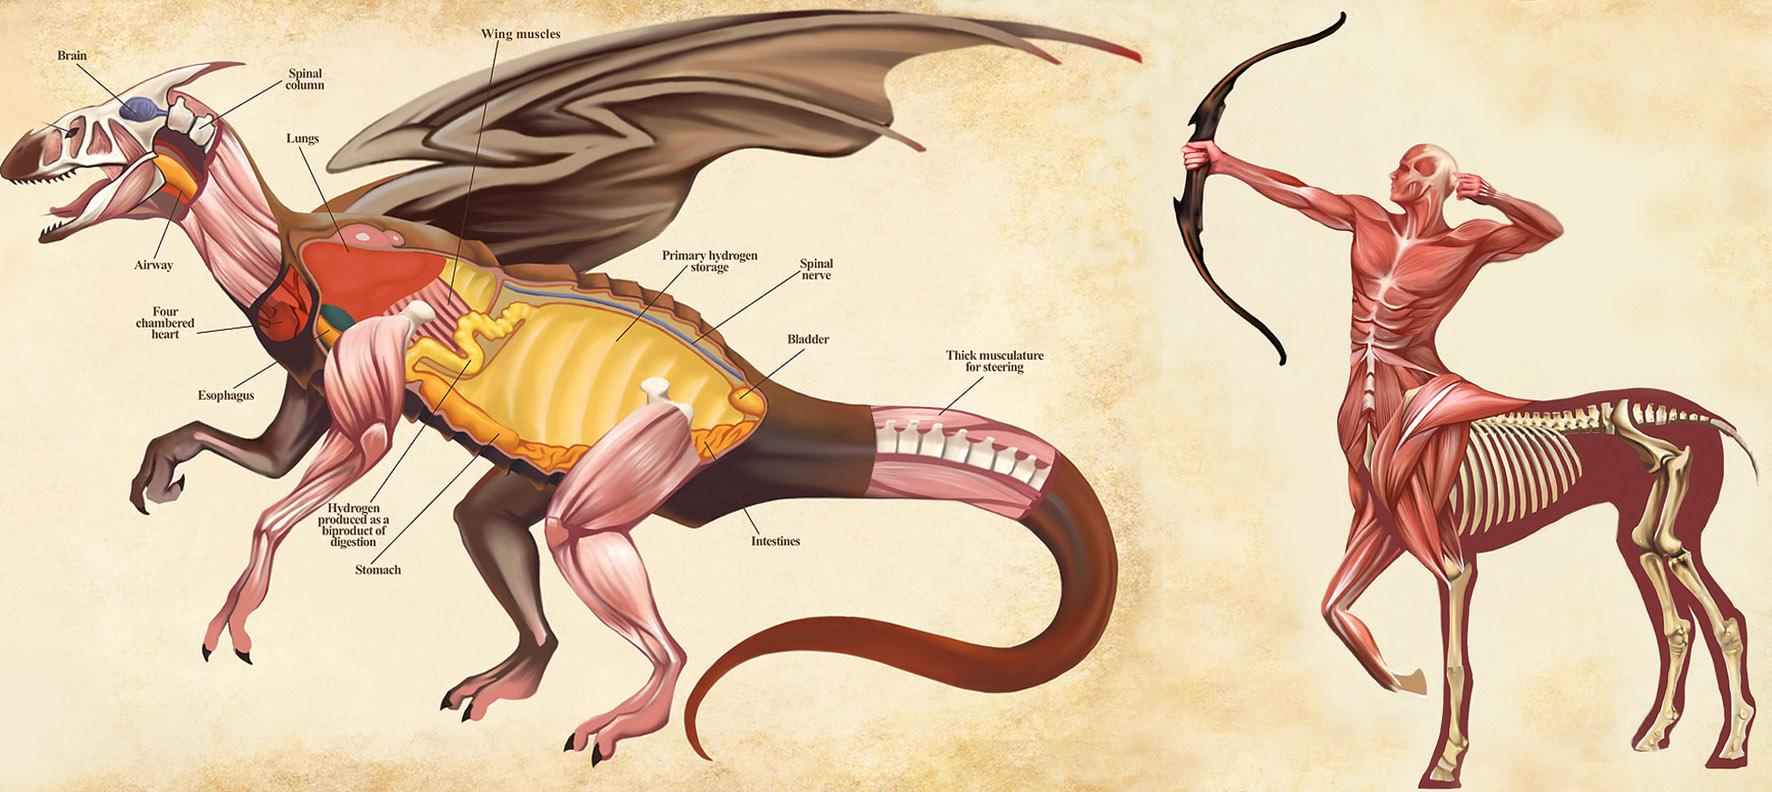 anatomie, anatomy, Christopher Stoll, centaur anatomie, dragon anatomy, draak van binnen